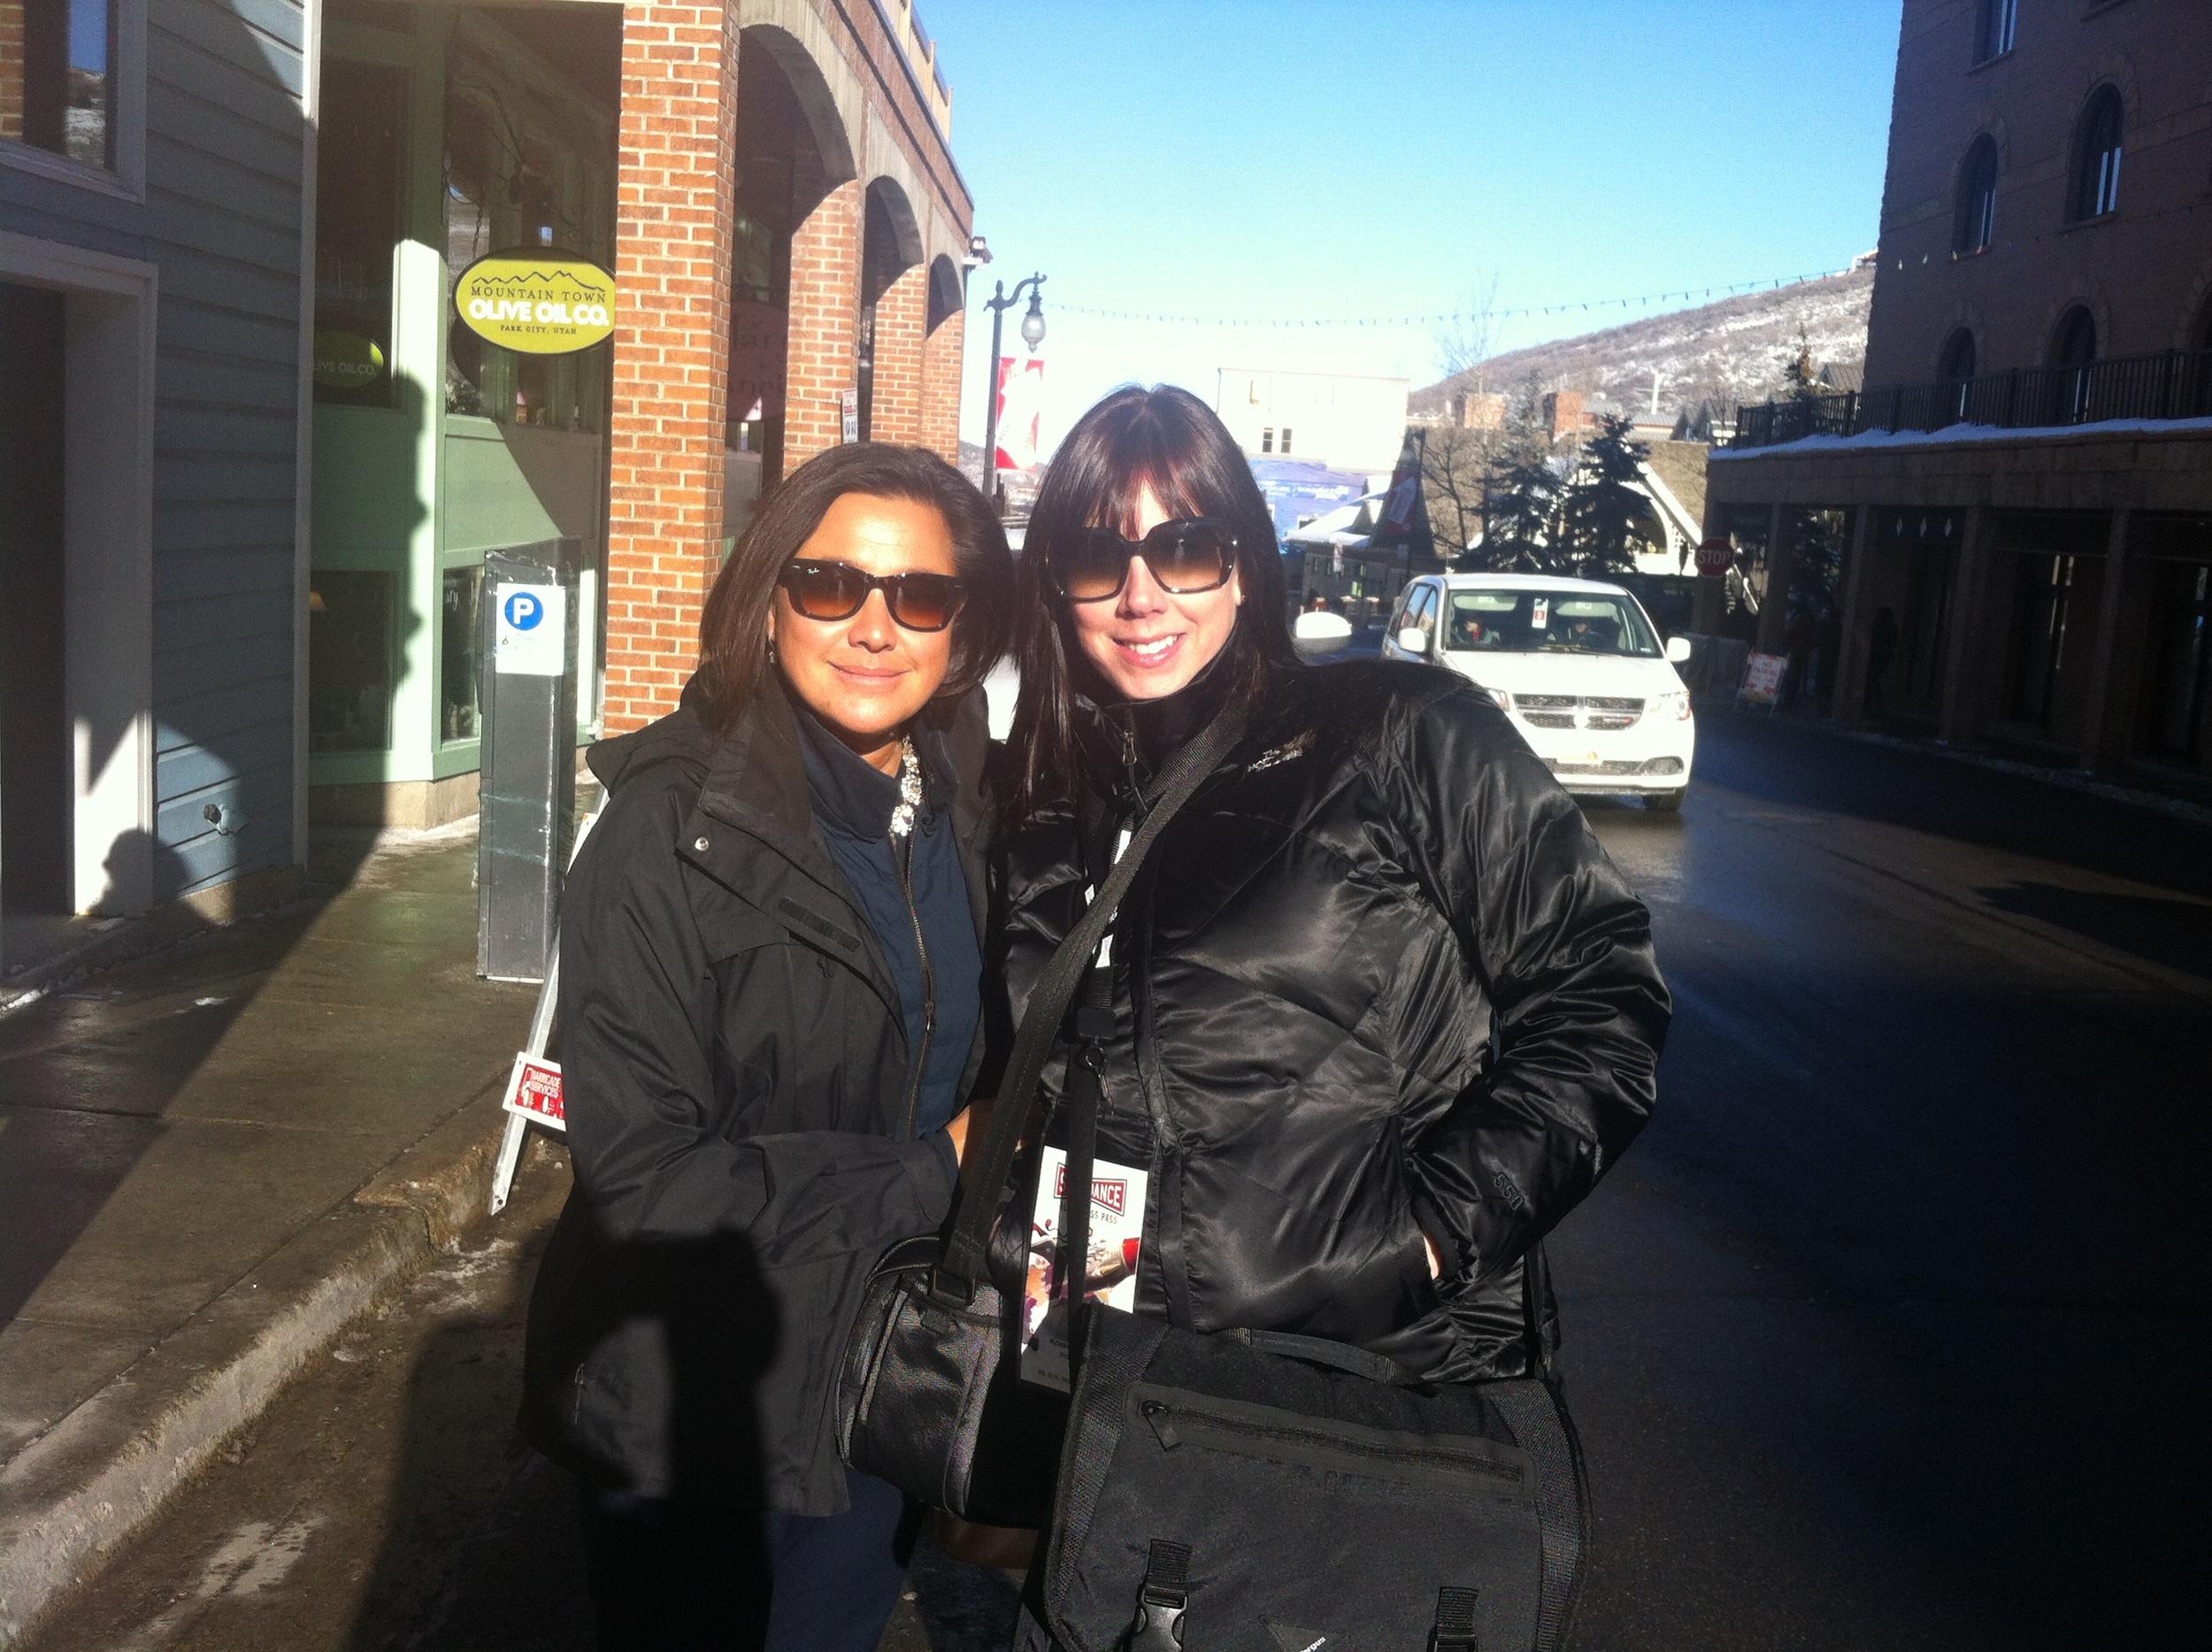 IndieFlix CEO, Scilla Andreen & COO, Kristie Lanum at the Sundance Film Festival